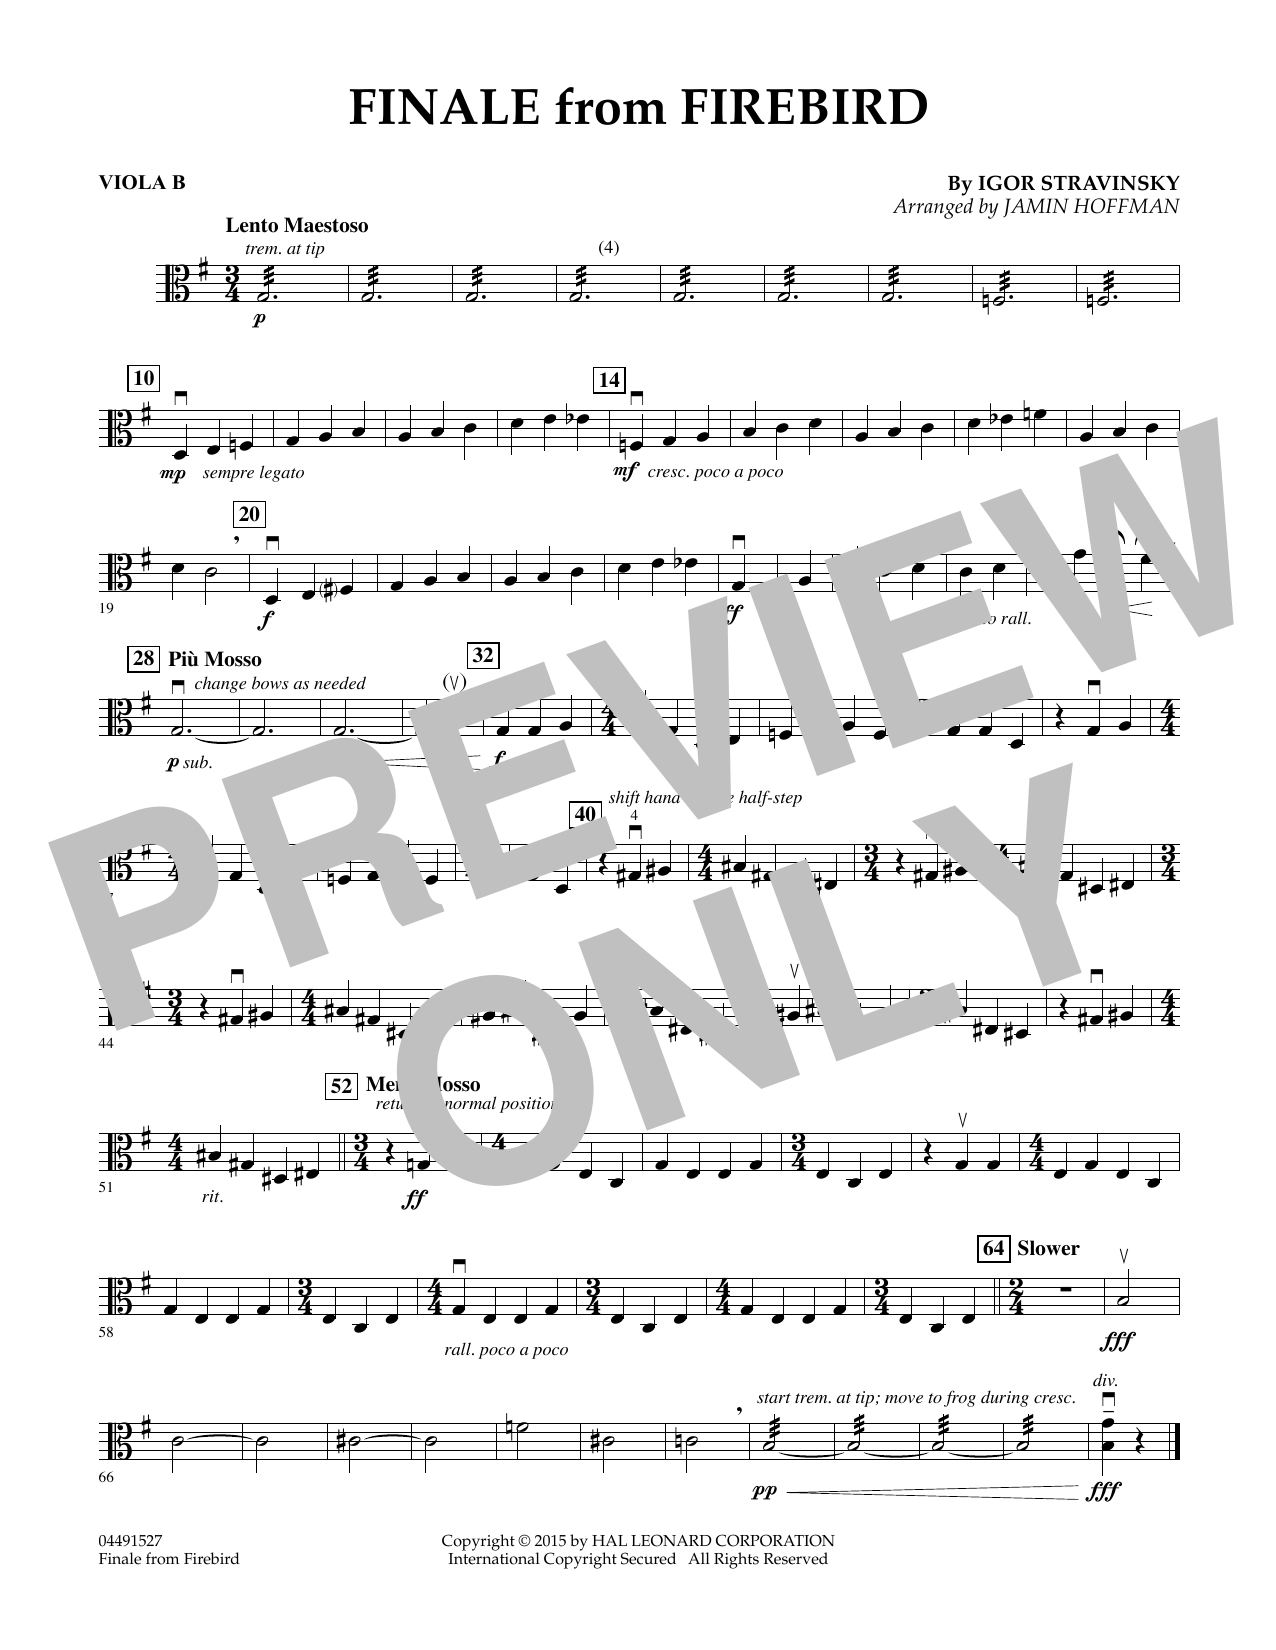 Finale from Firebird (arr. Jamin Hoffman) - Viola B (Orchestra)